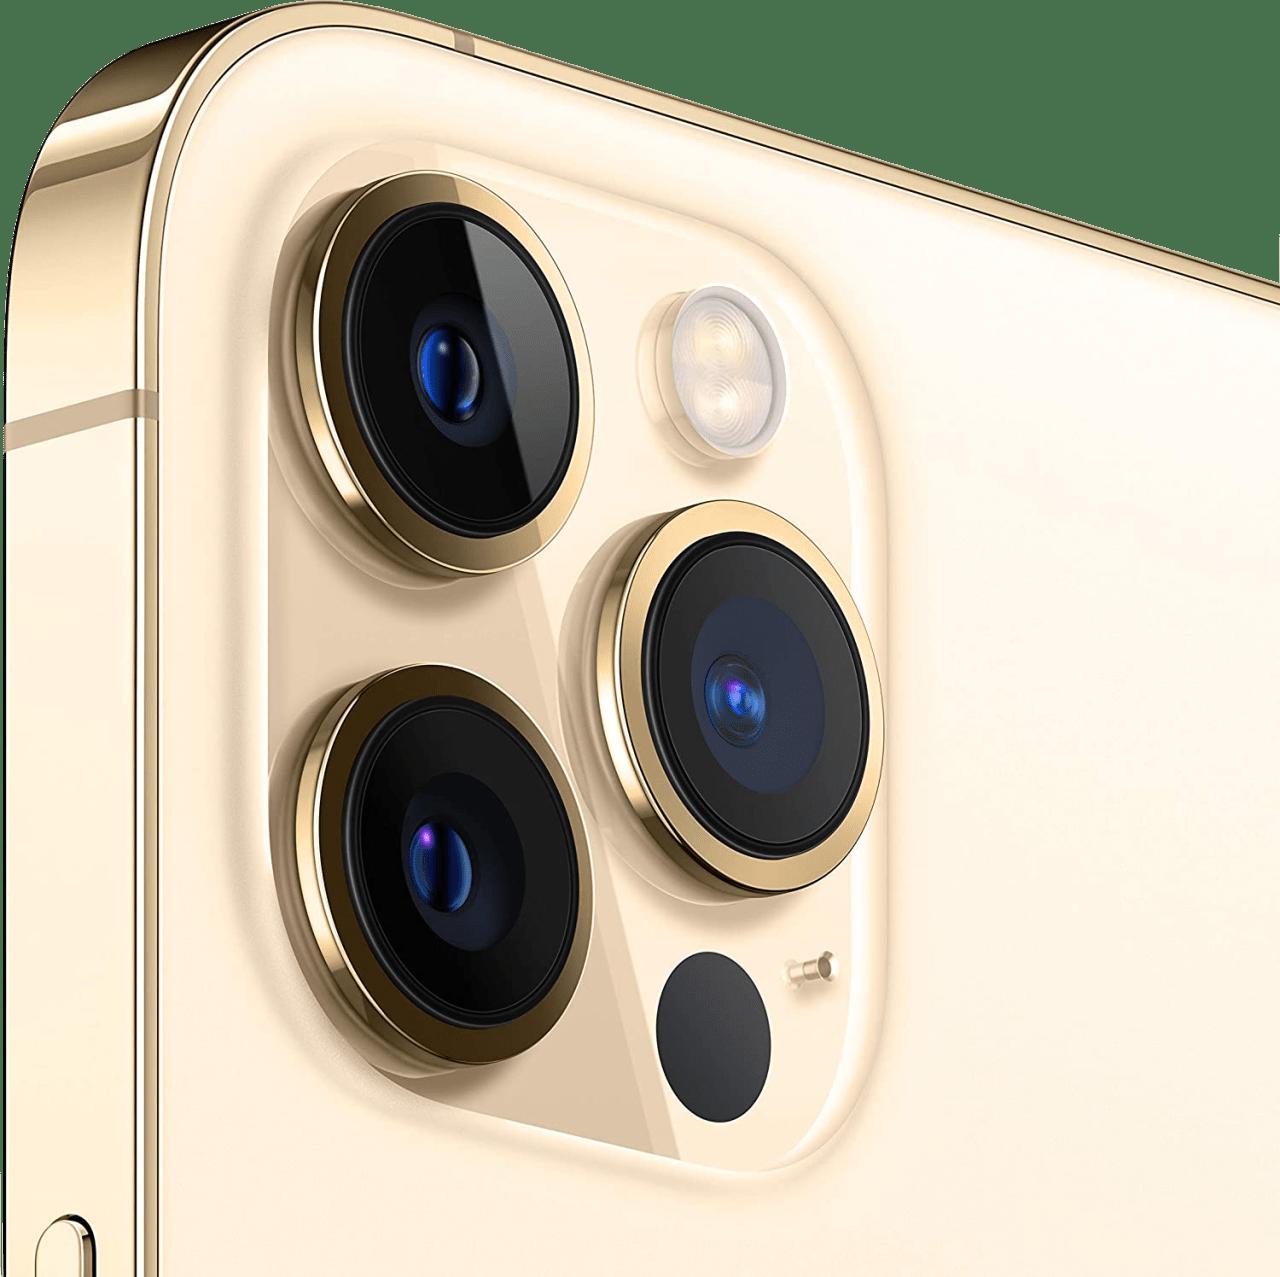 Gold Apple iPhone 12 Pro Max 256GB.2